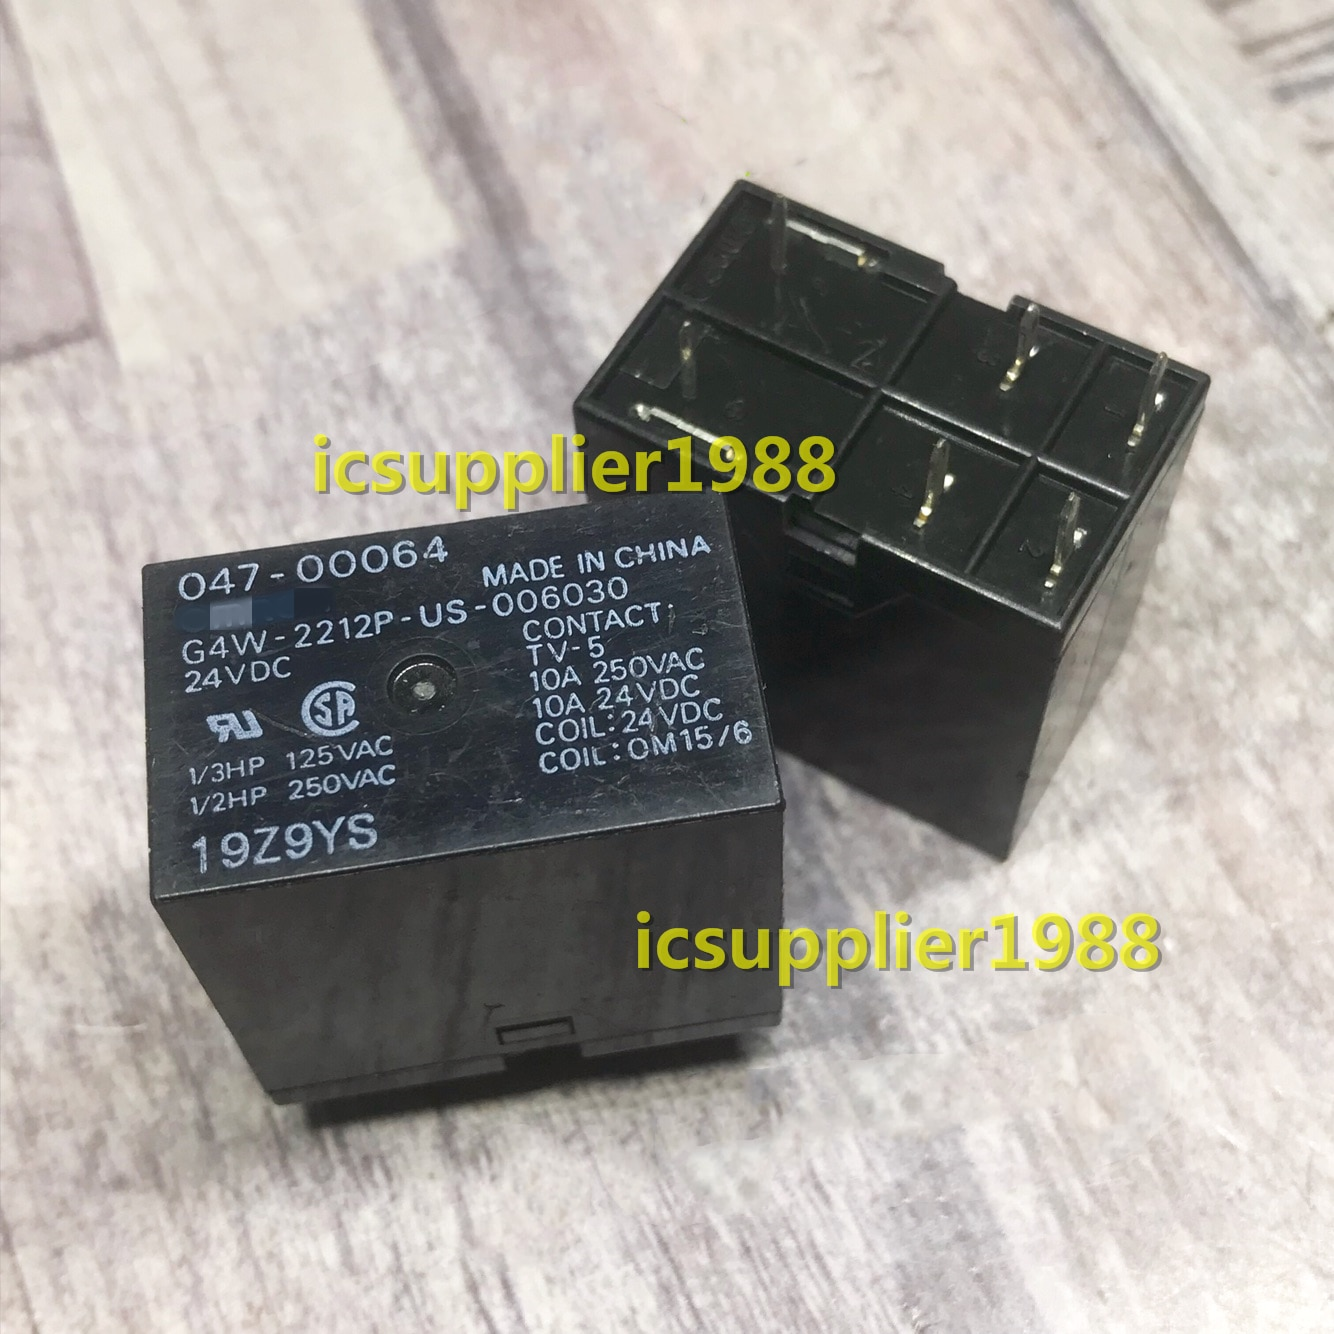 G4W-2212P-US 006030 G4W-2212P-US-006030-24VDC 24V 6Pin DIP6 Relé